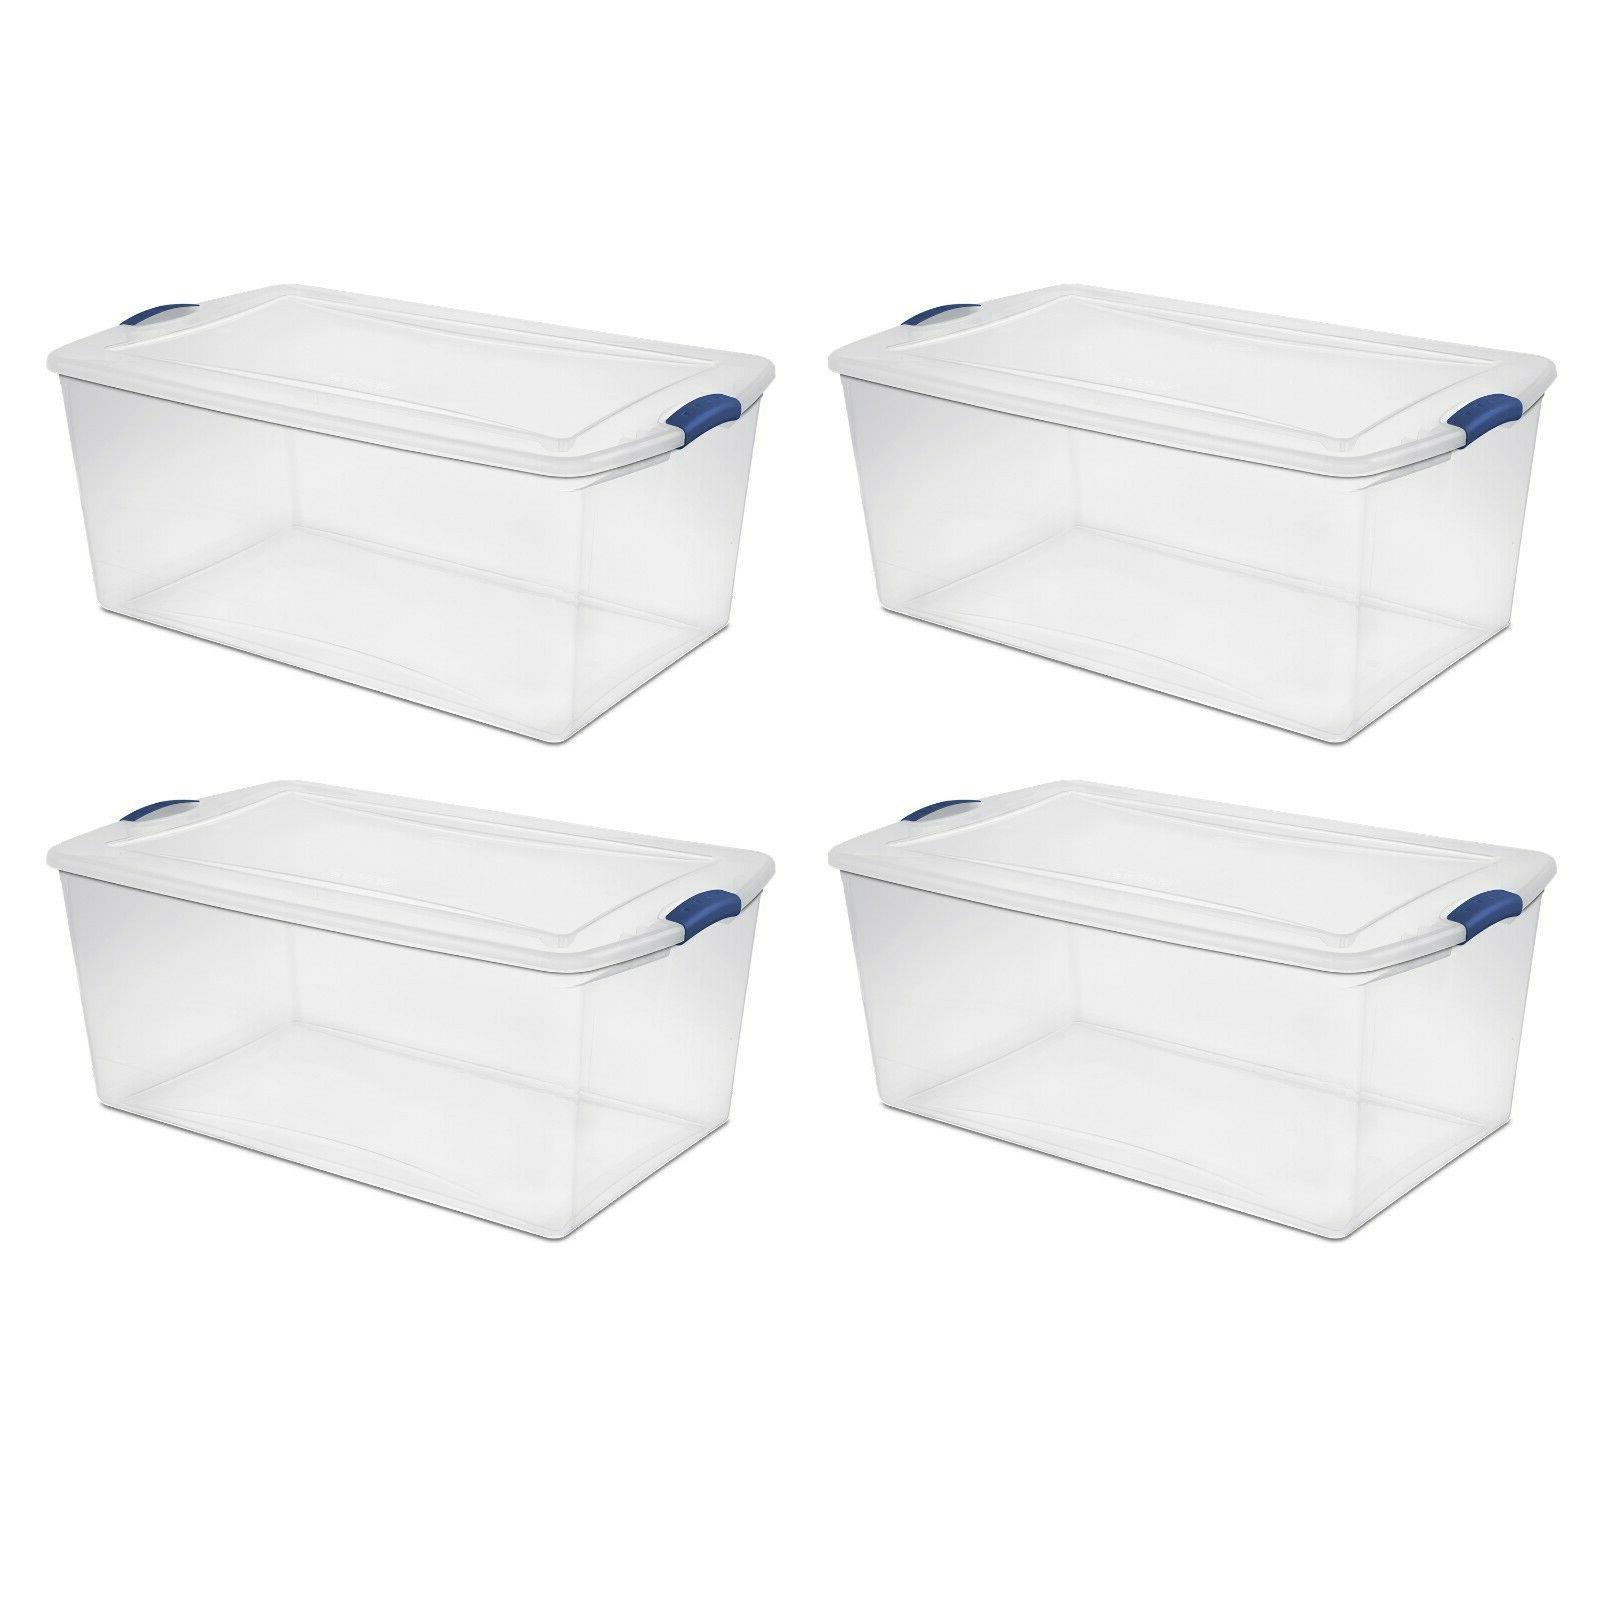 4 plastic storage totes large box bin